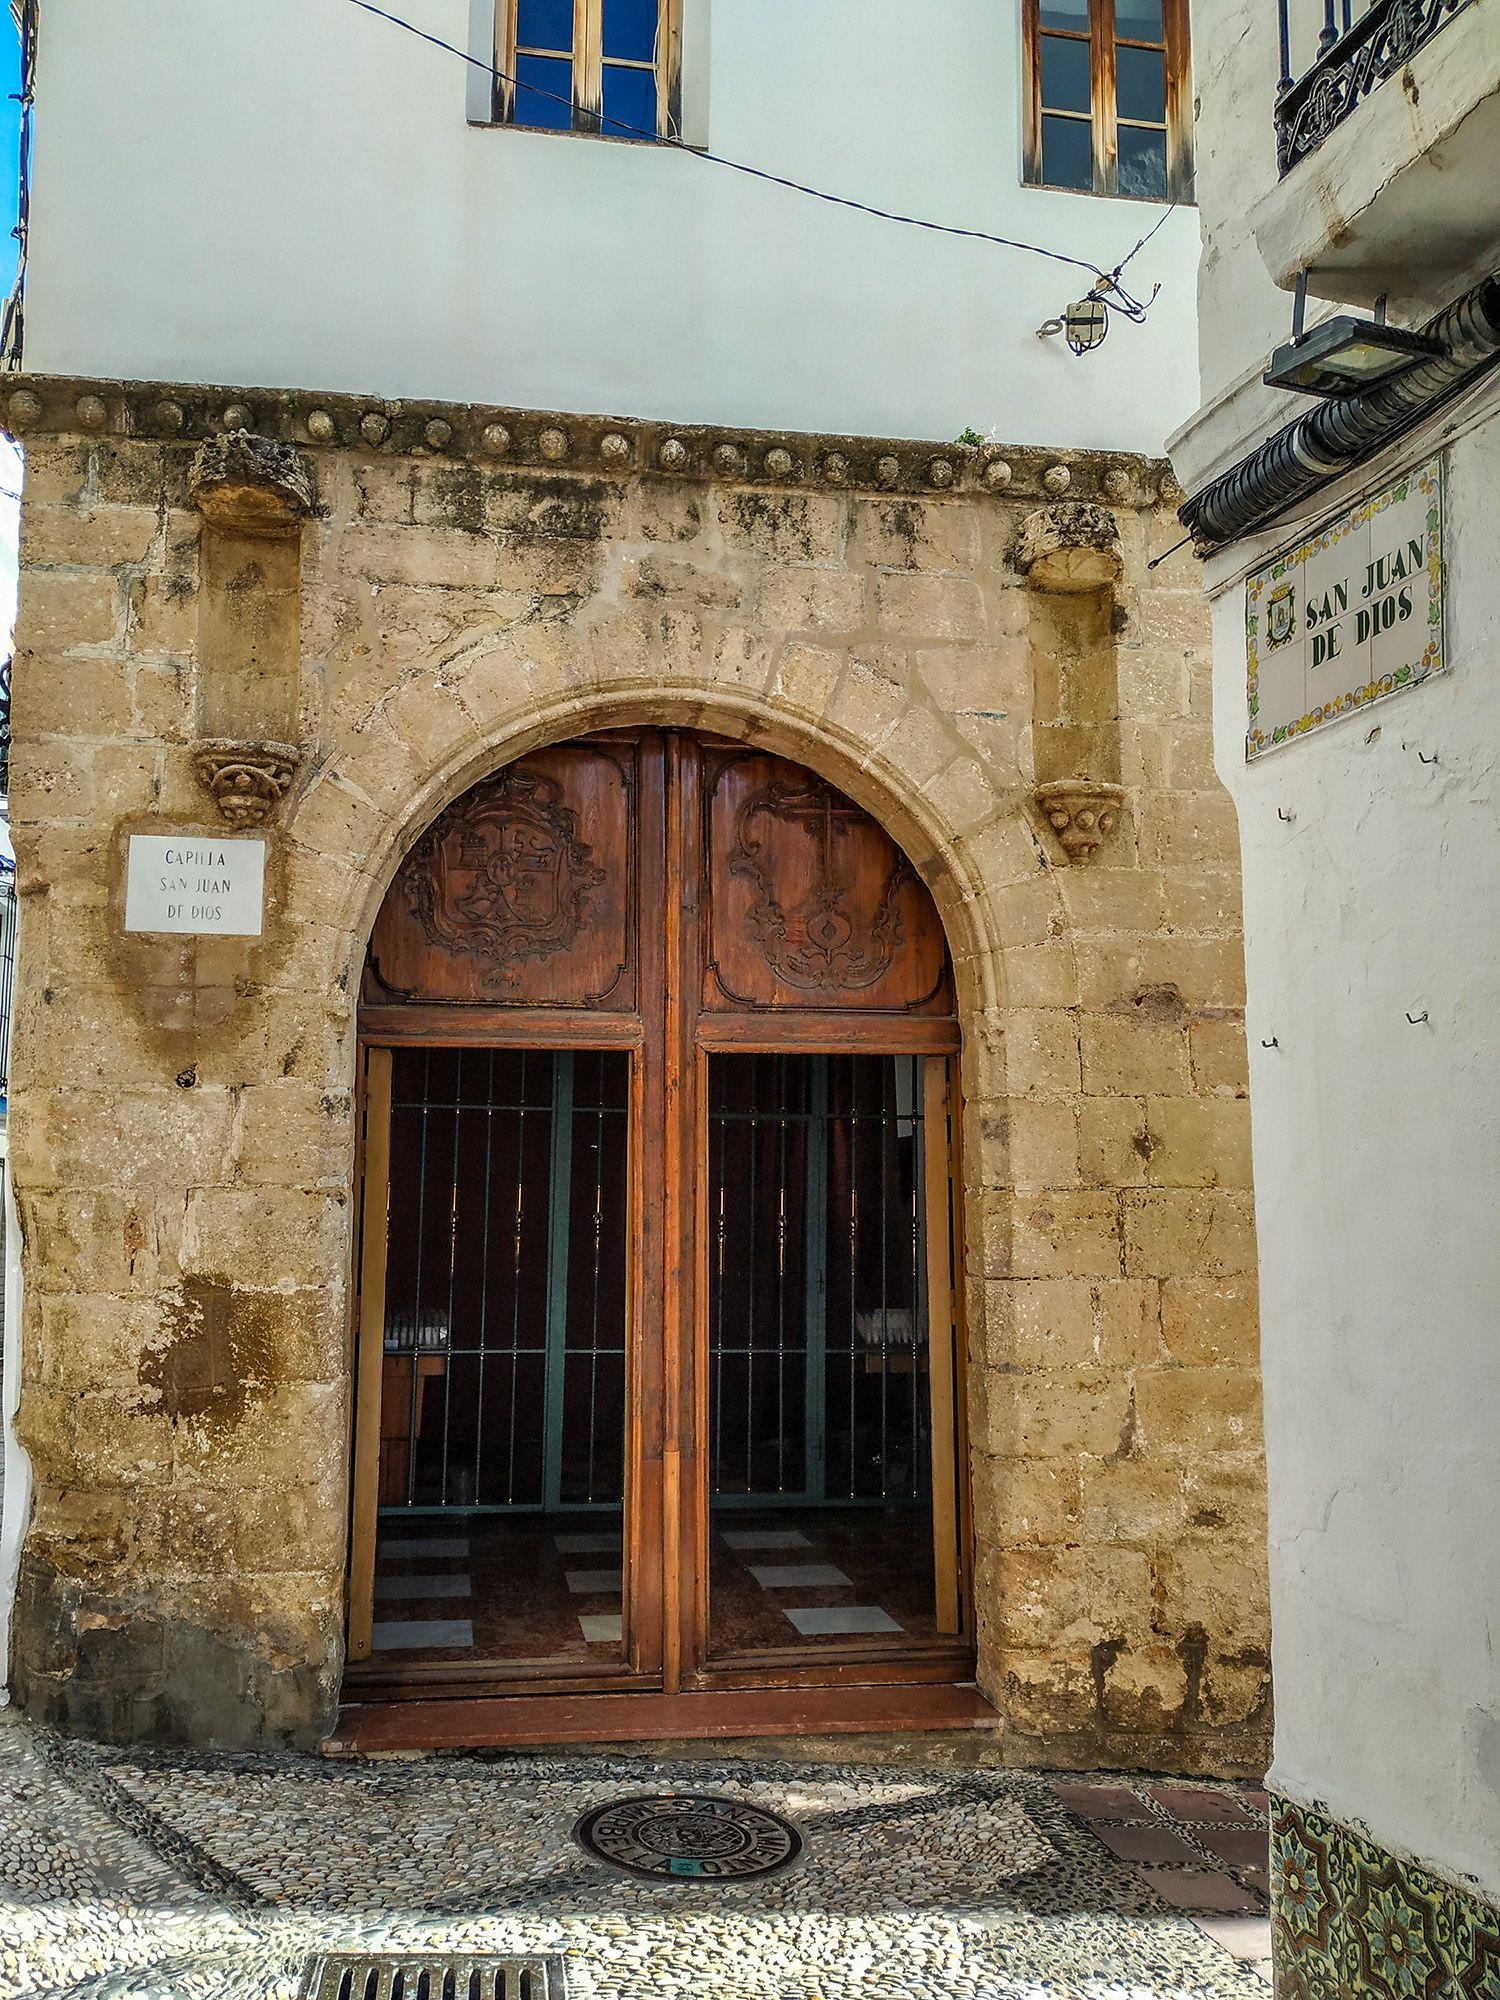 Capilla de San Juan de Dios, Marbella